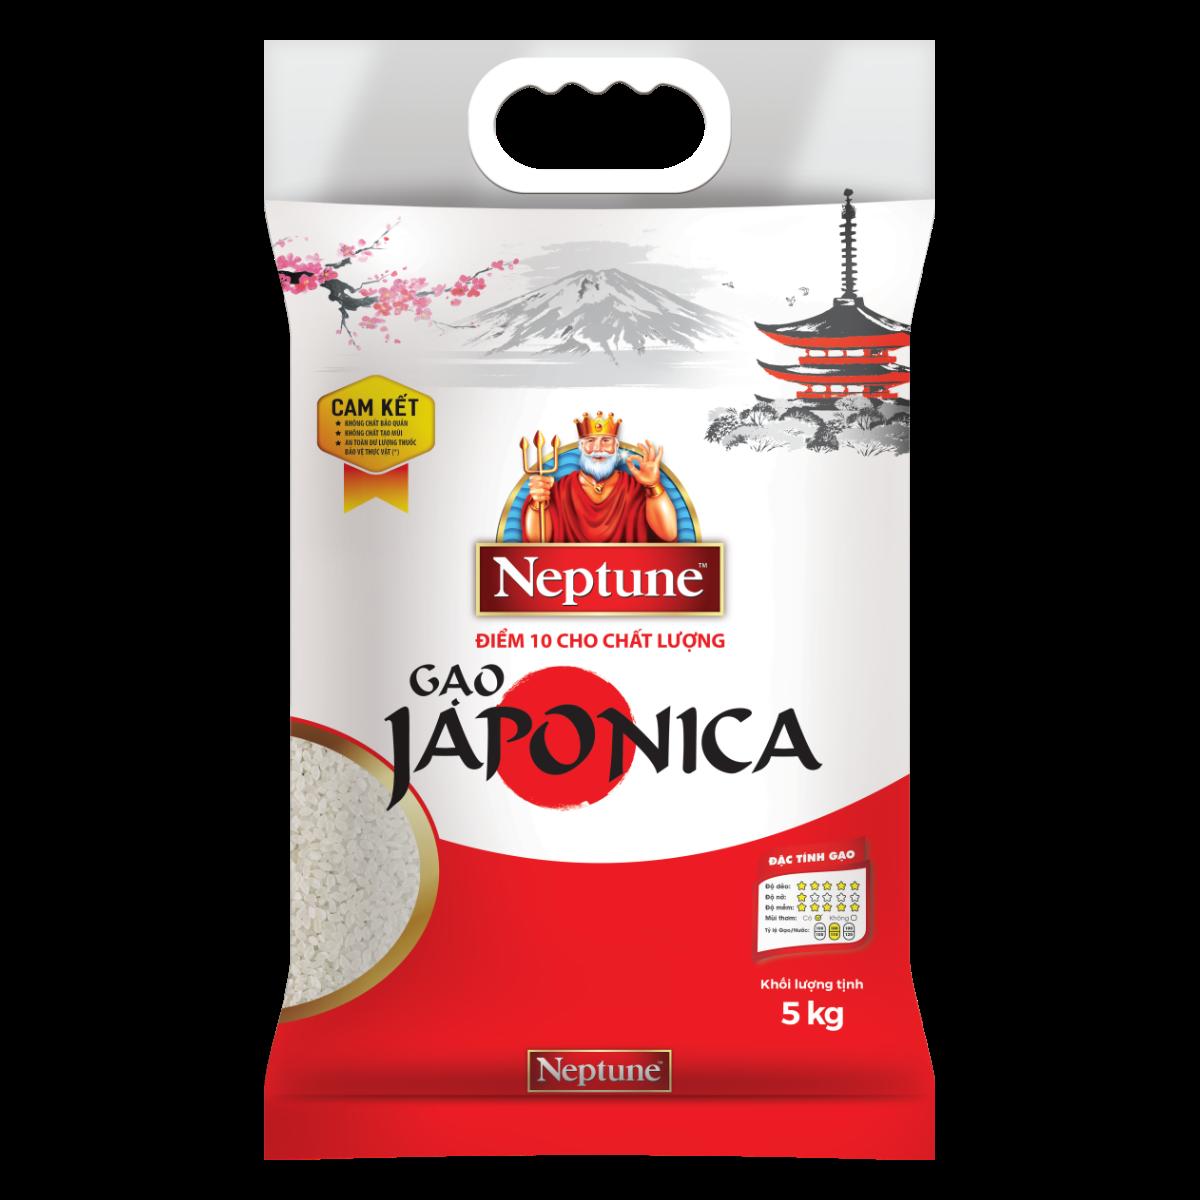 Gạo Japonica Neptune